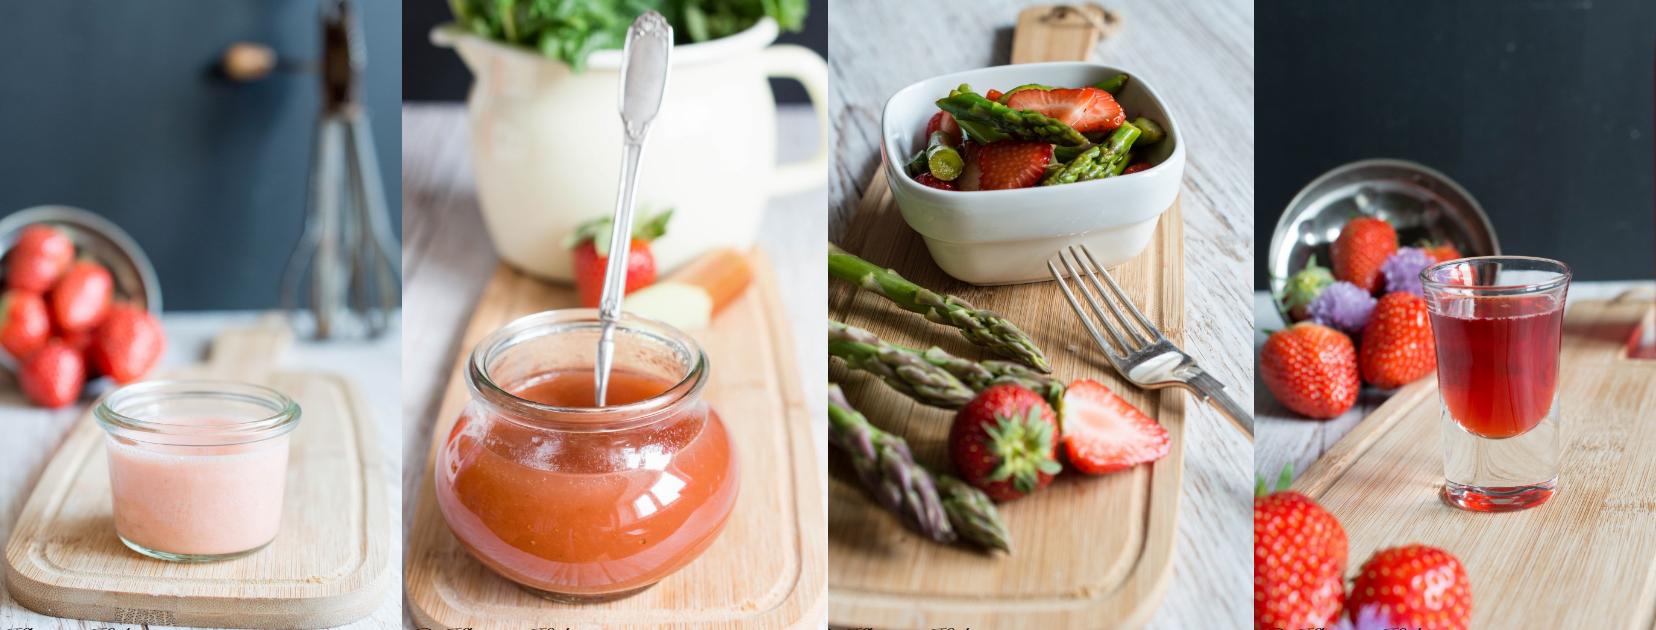 Rezepte mit Erdbeeren - Kleines Kuliversum